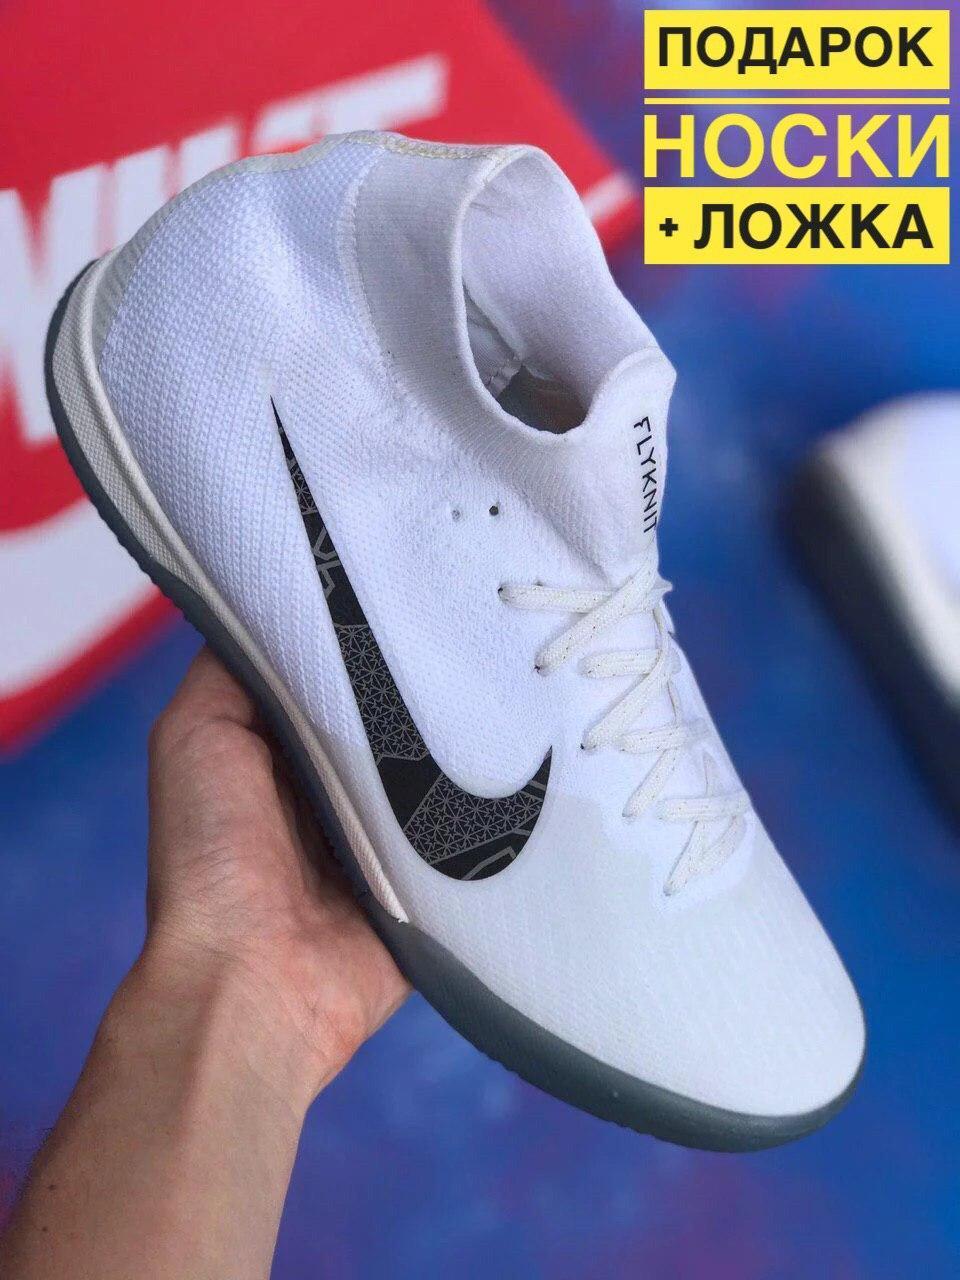 Футзалки Nike Mercurial Fly Knit/ найк меркуриал/ с носком